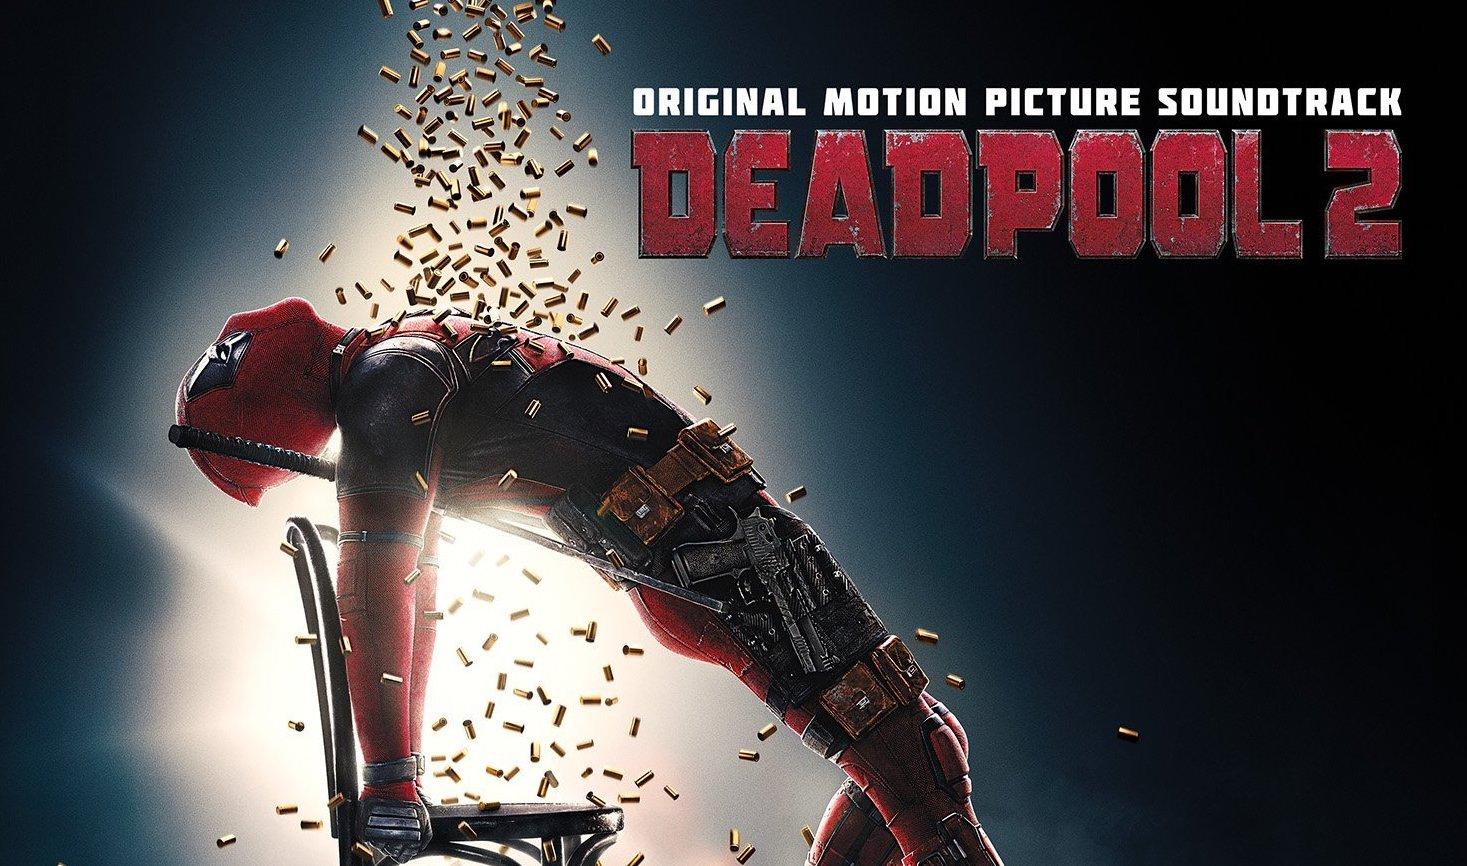 Deadpool-2-movie-soundtrack-2018-interview-Tyler-Bates